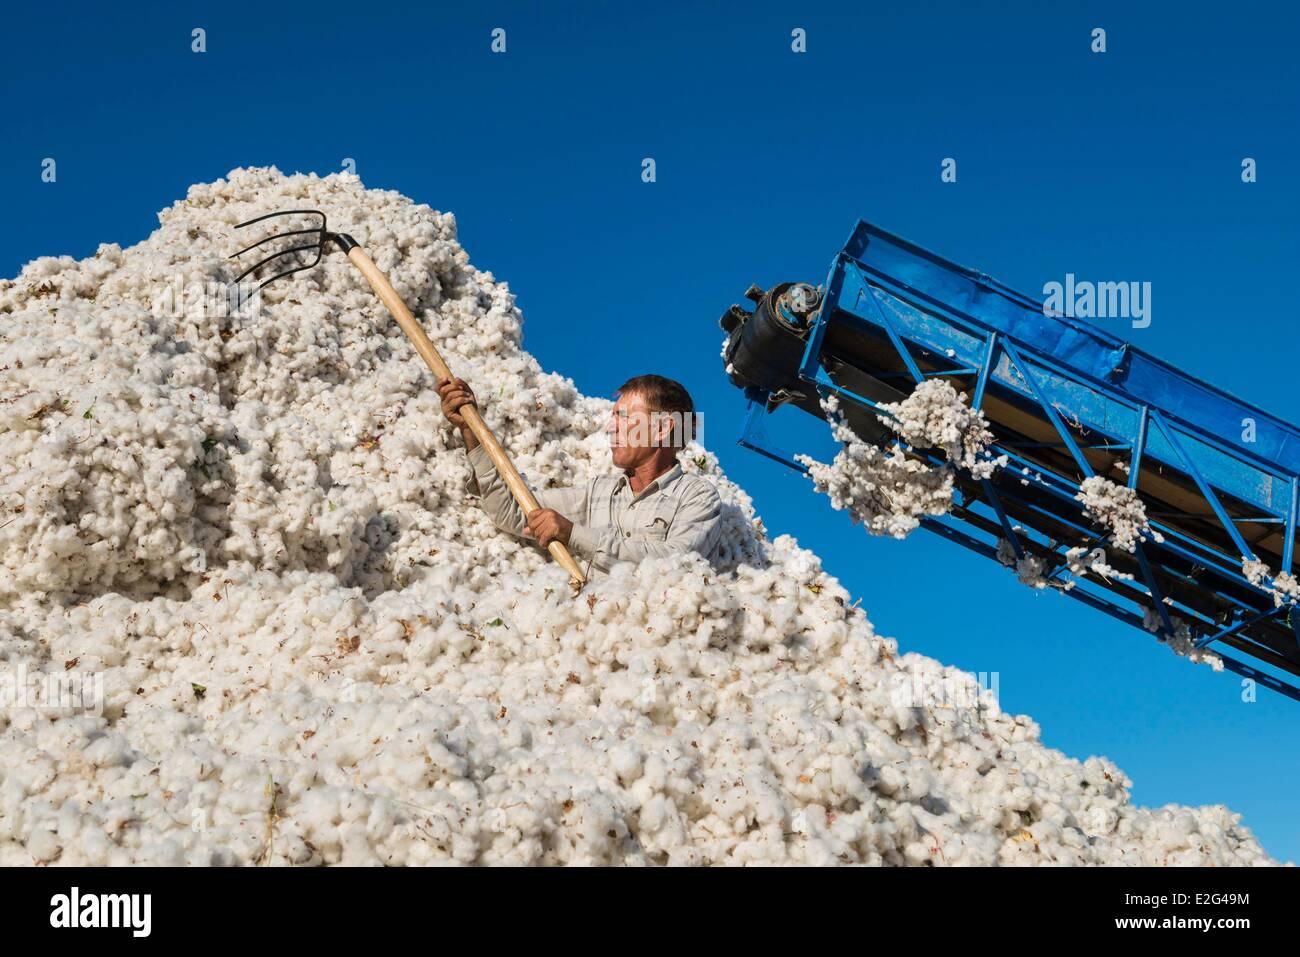 Uzbekistan Silk Road Khorezm province a worker in a cotton (Gossypium sp.) platform - Stock Image